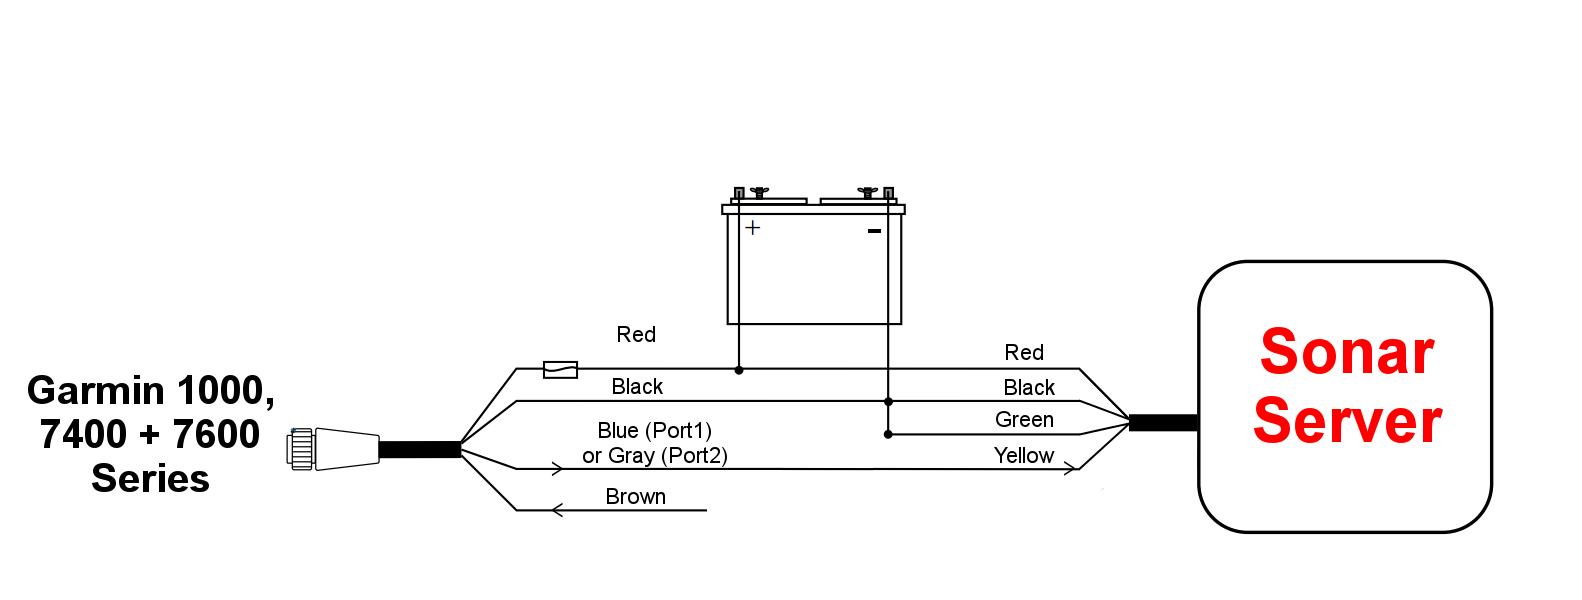 interfacing to garmin multi function displays sonar server the wiring diagram